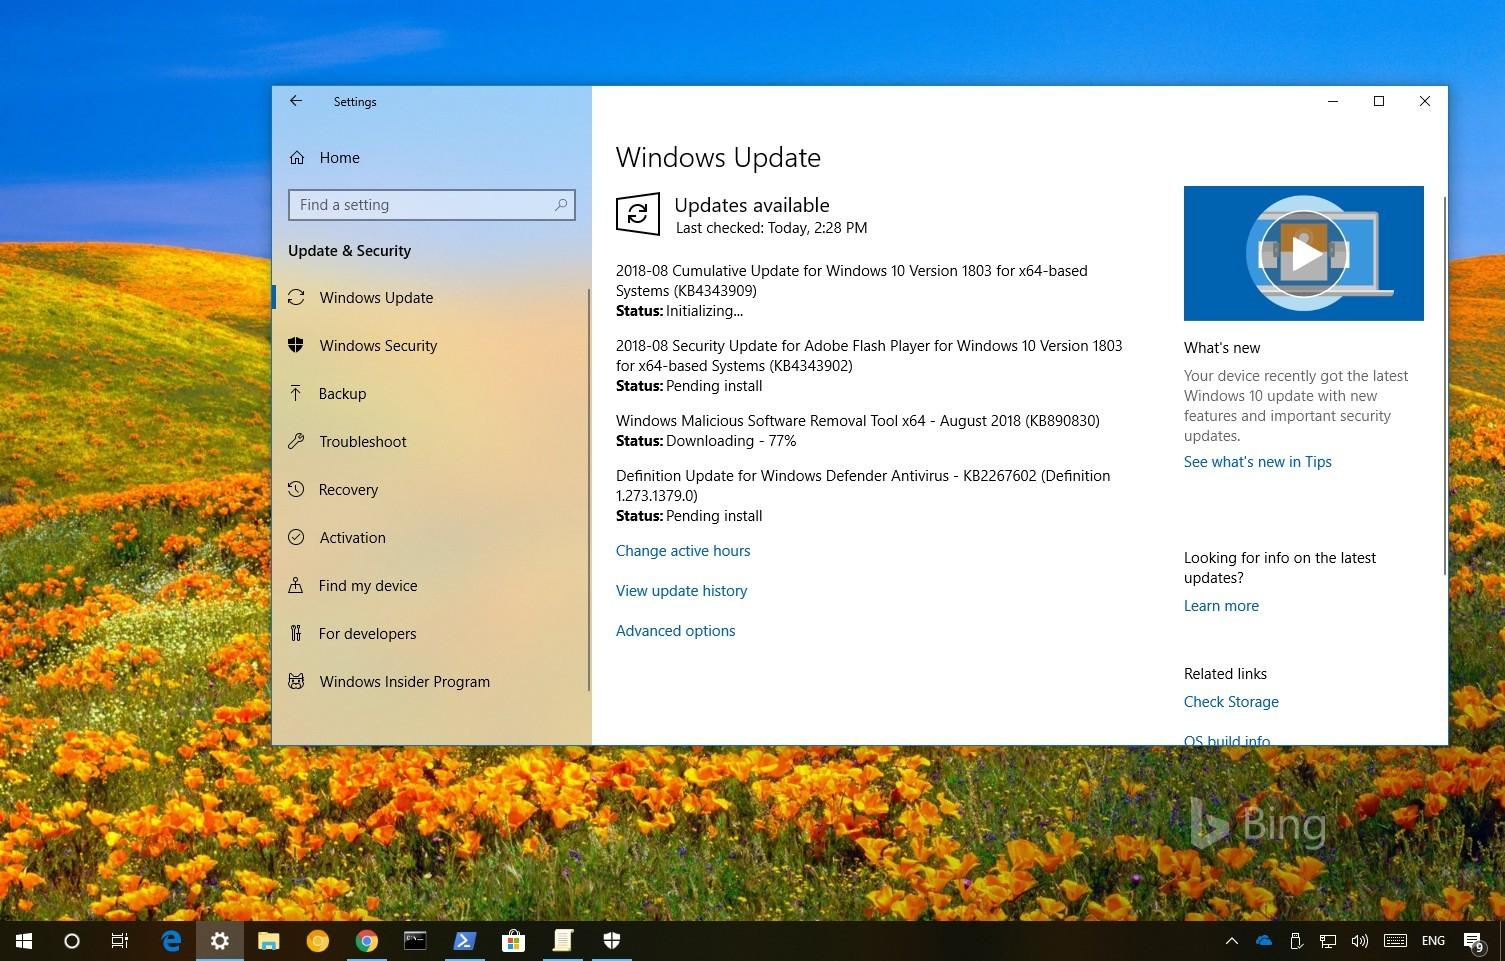 Windows 10 update KB4343909